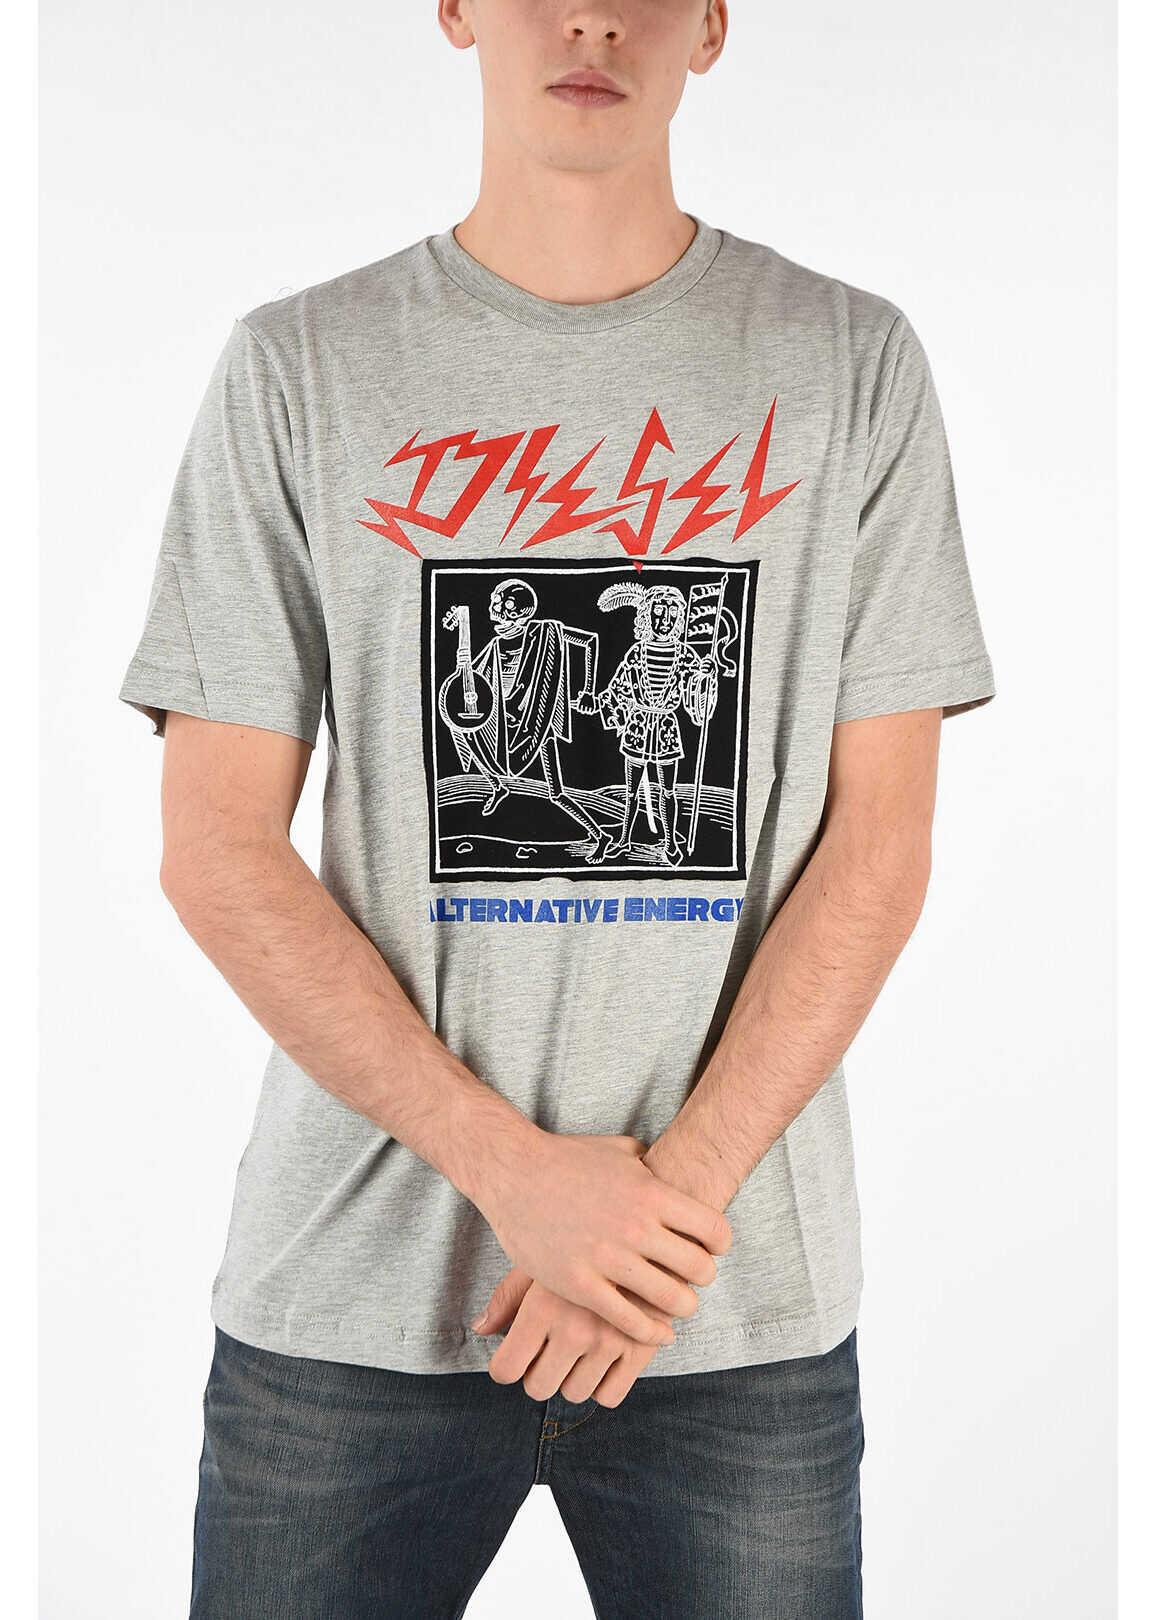 Diesel Printed T-JUST-XP T-shirt GRAY